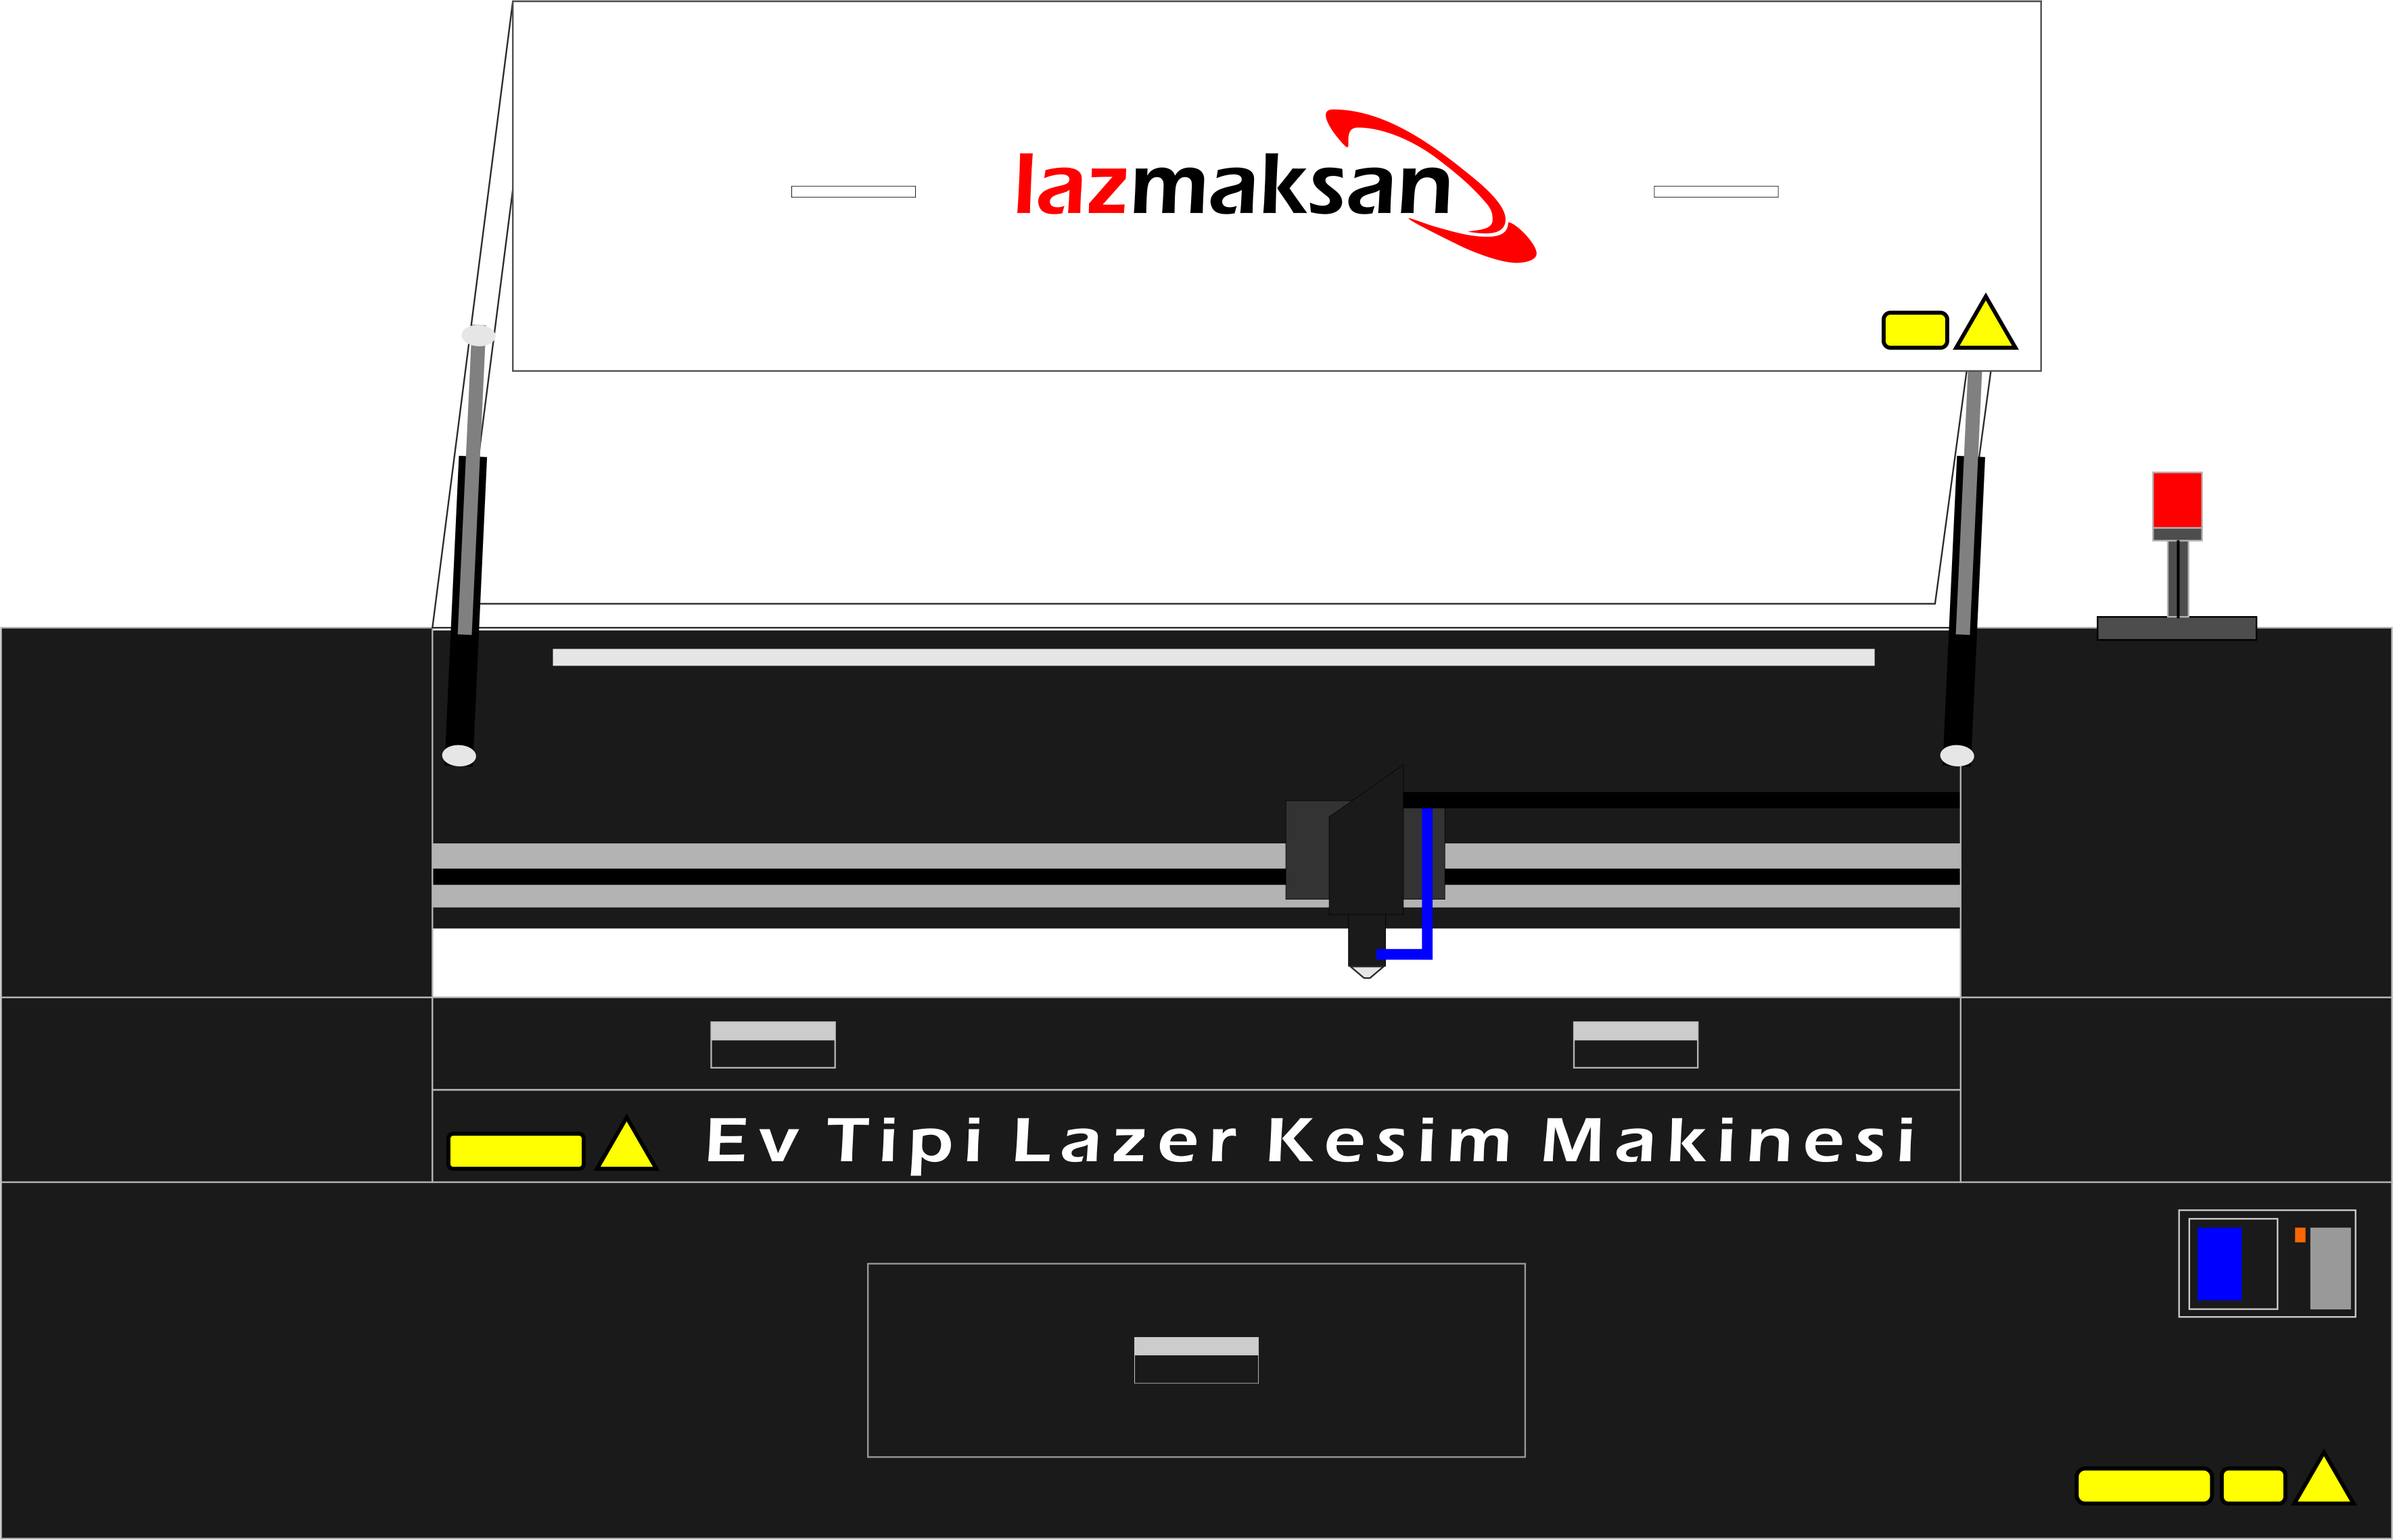 ev-tipi-lazer-kesim-makinesi-6040-open-cover